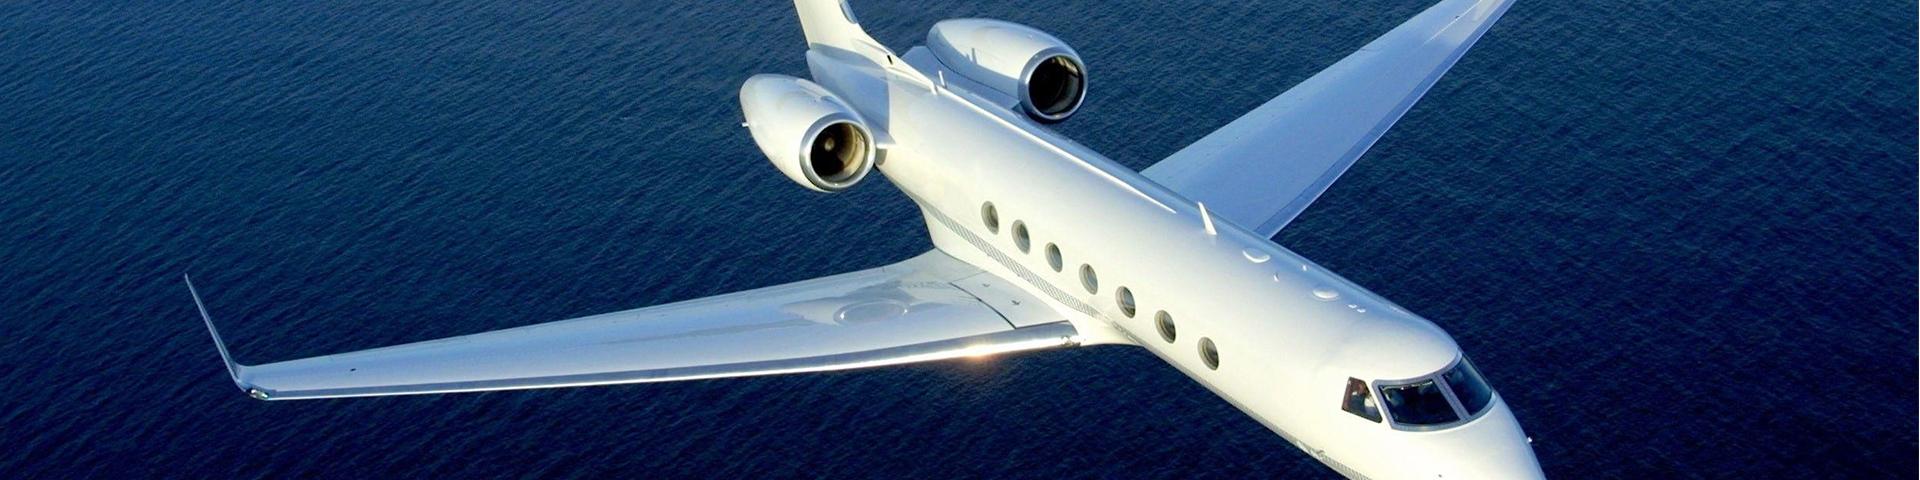 gulfstream g550 1542991 - Gulfstream G550